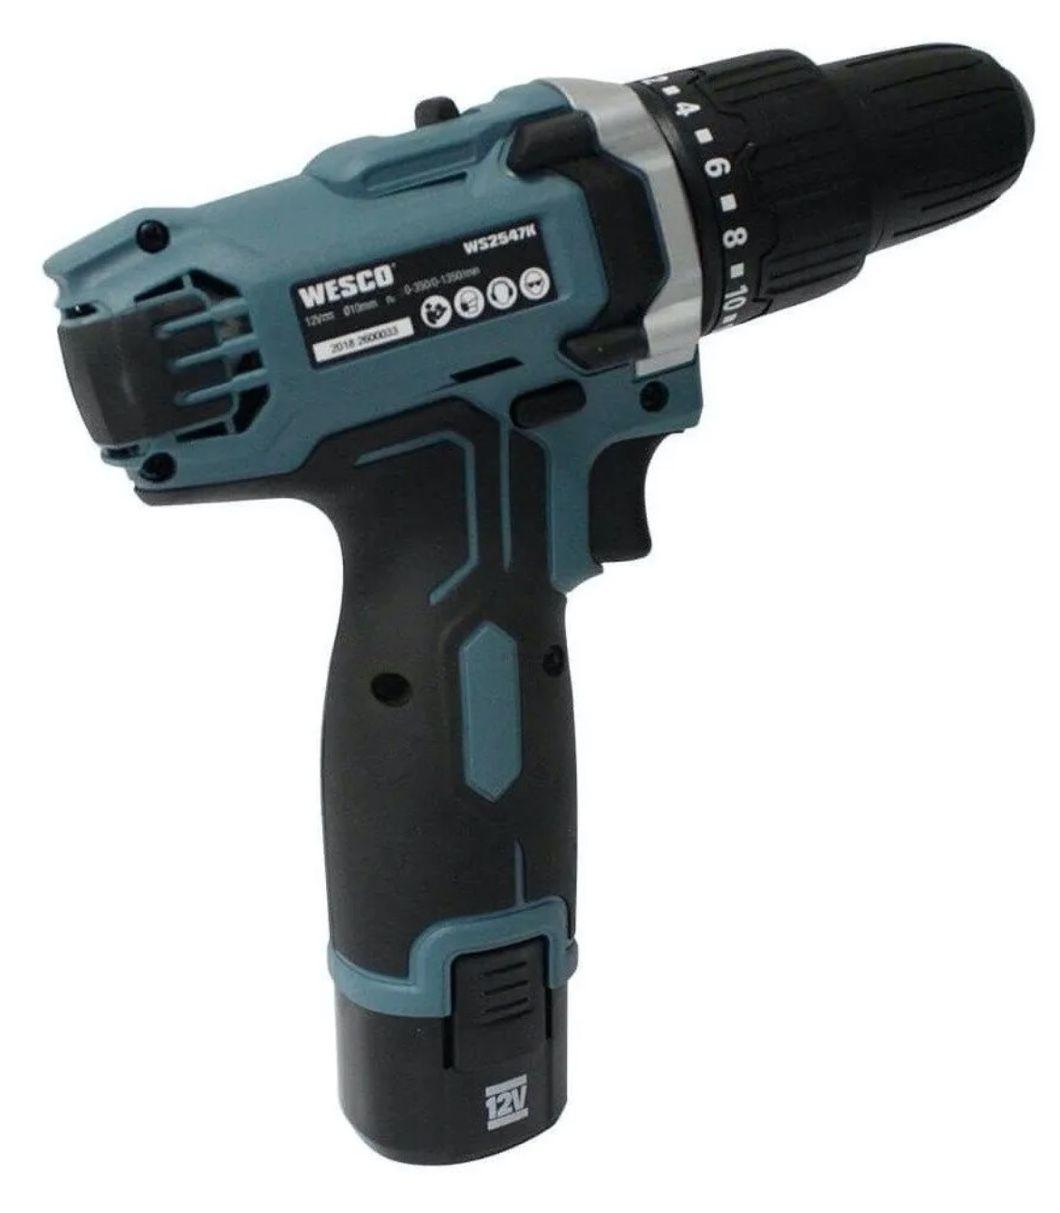 "Parafusadeira / Furadeira Impacto Wesco 3/8"" 10mm 12v WS2547 + carregador bivolt"